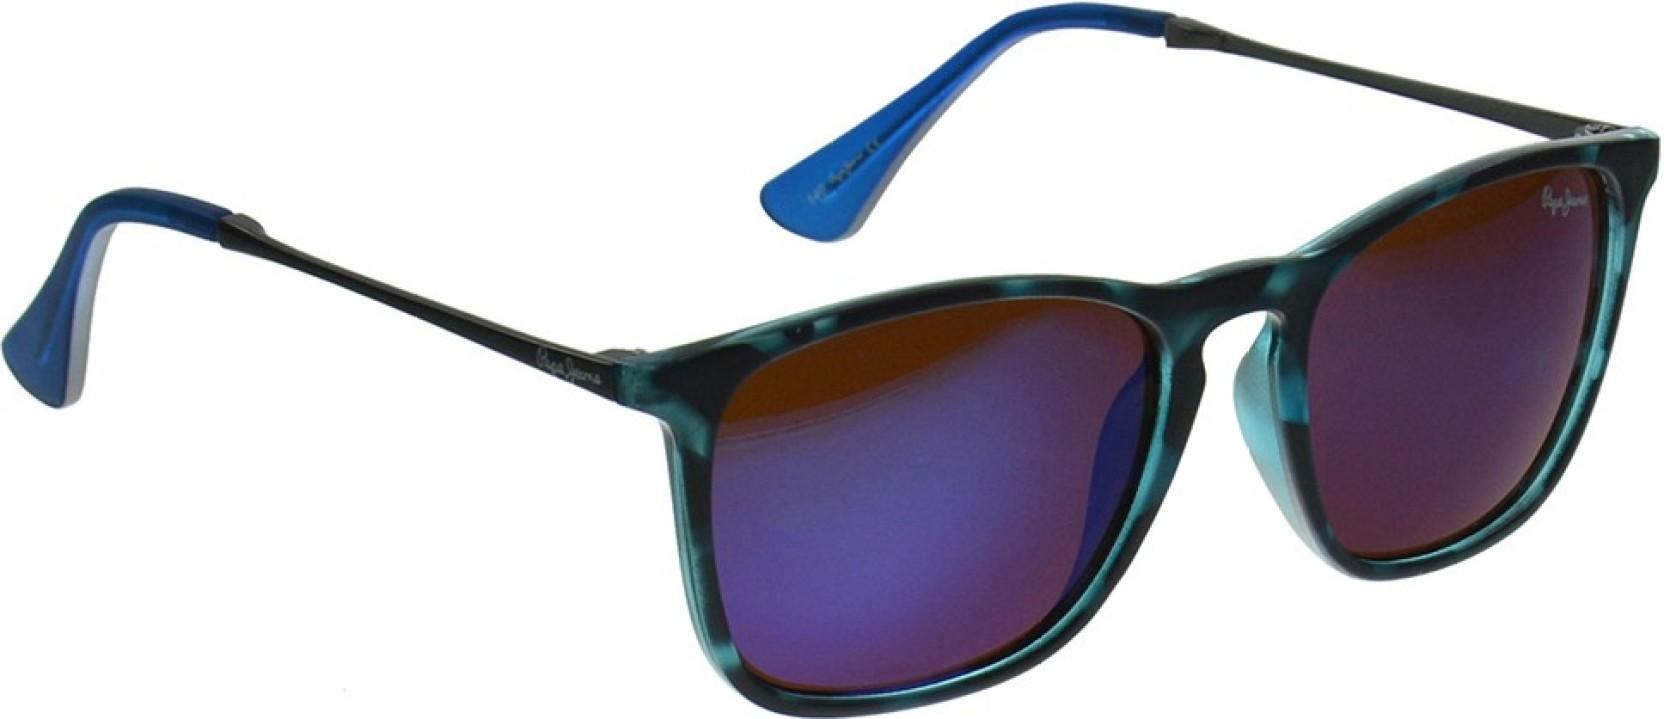 d41cf49fab Buy Pepe Jeans Wayfarer Sunglasses Blue For Men Online   Best Prices ...